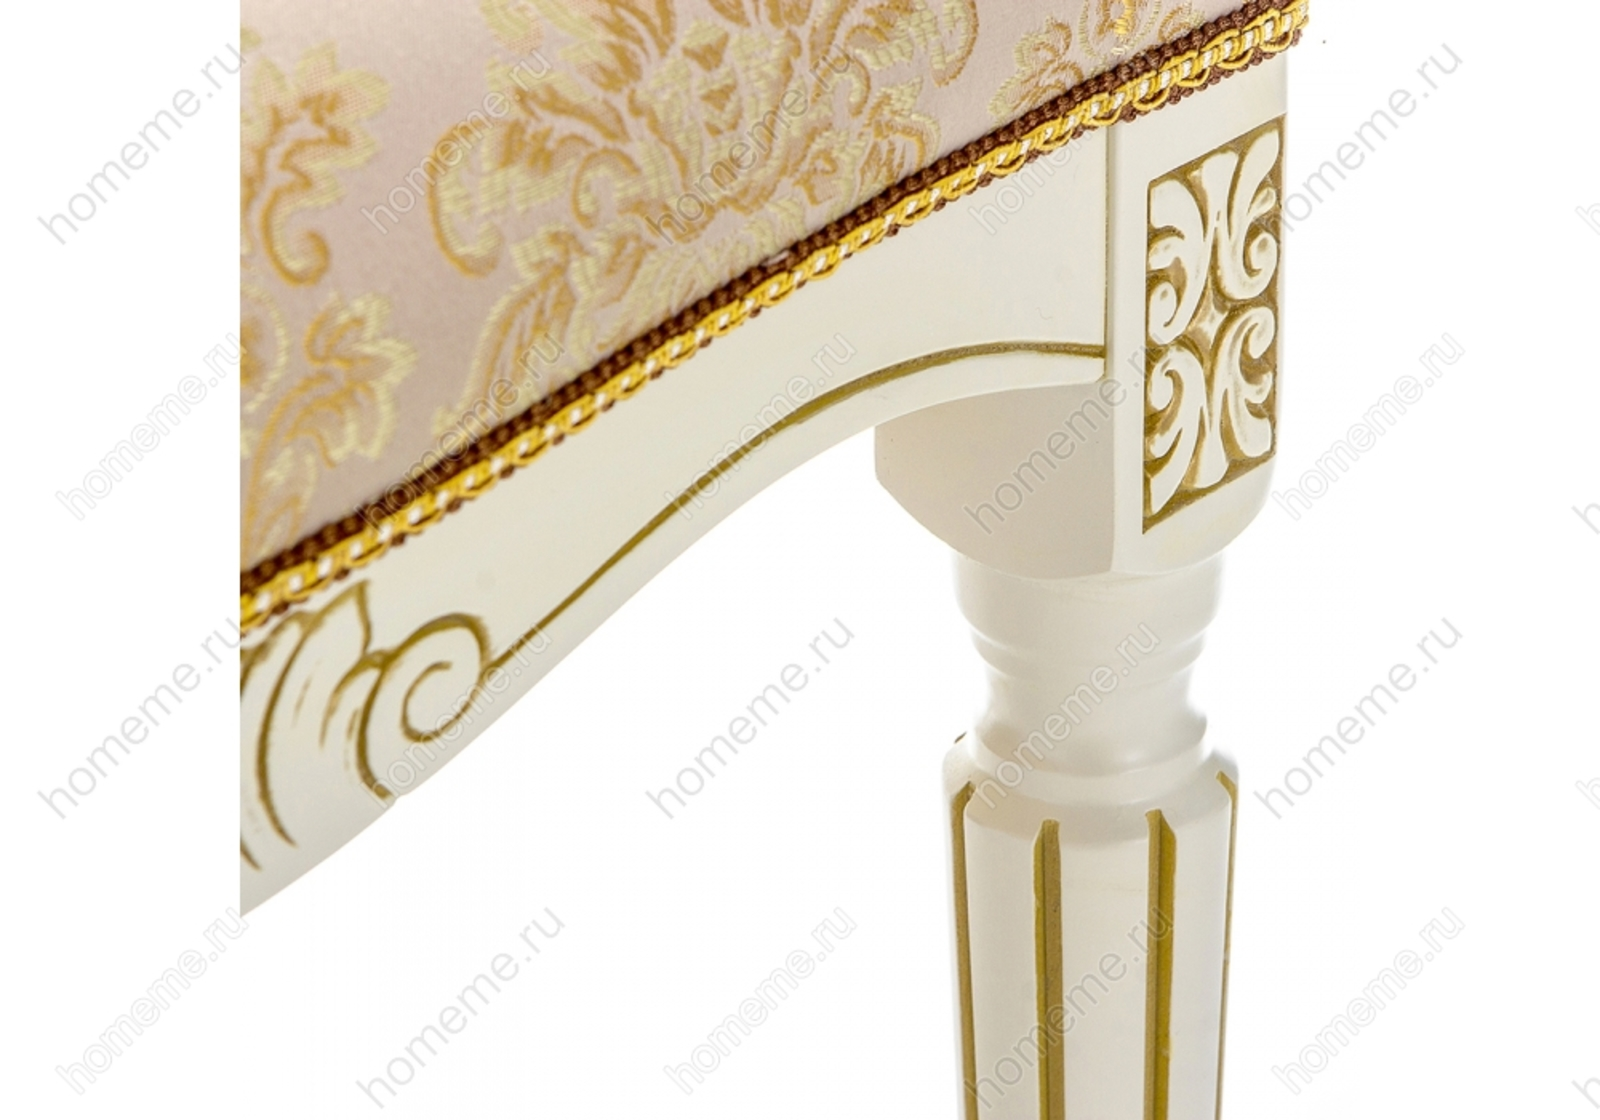 Стул деревянный Беттино патина золото / бежевый 309319 Беттино патина золото / бежевый 309319 (15886)